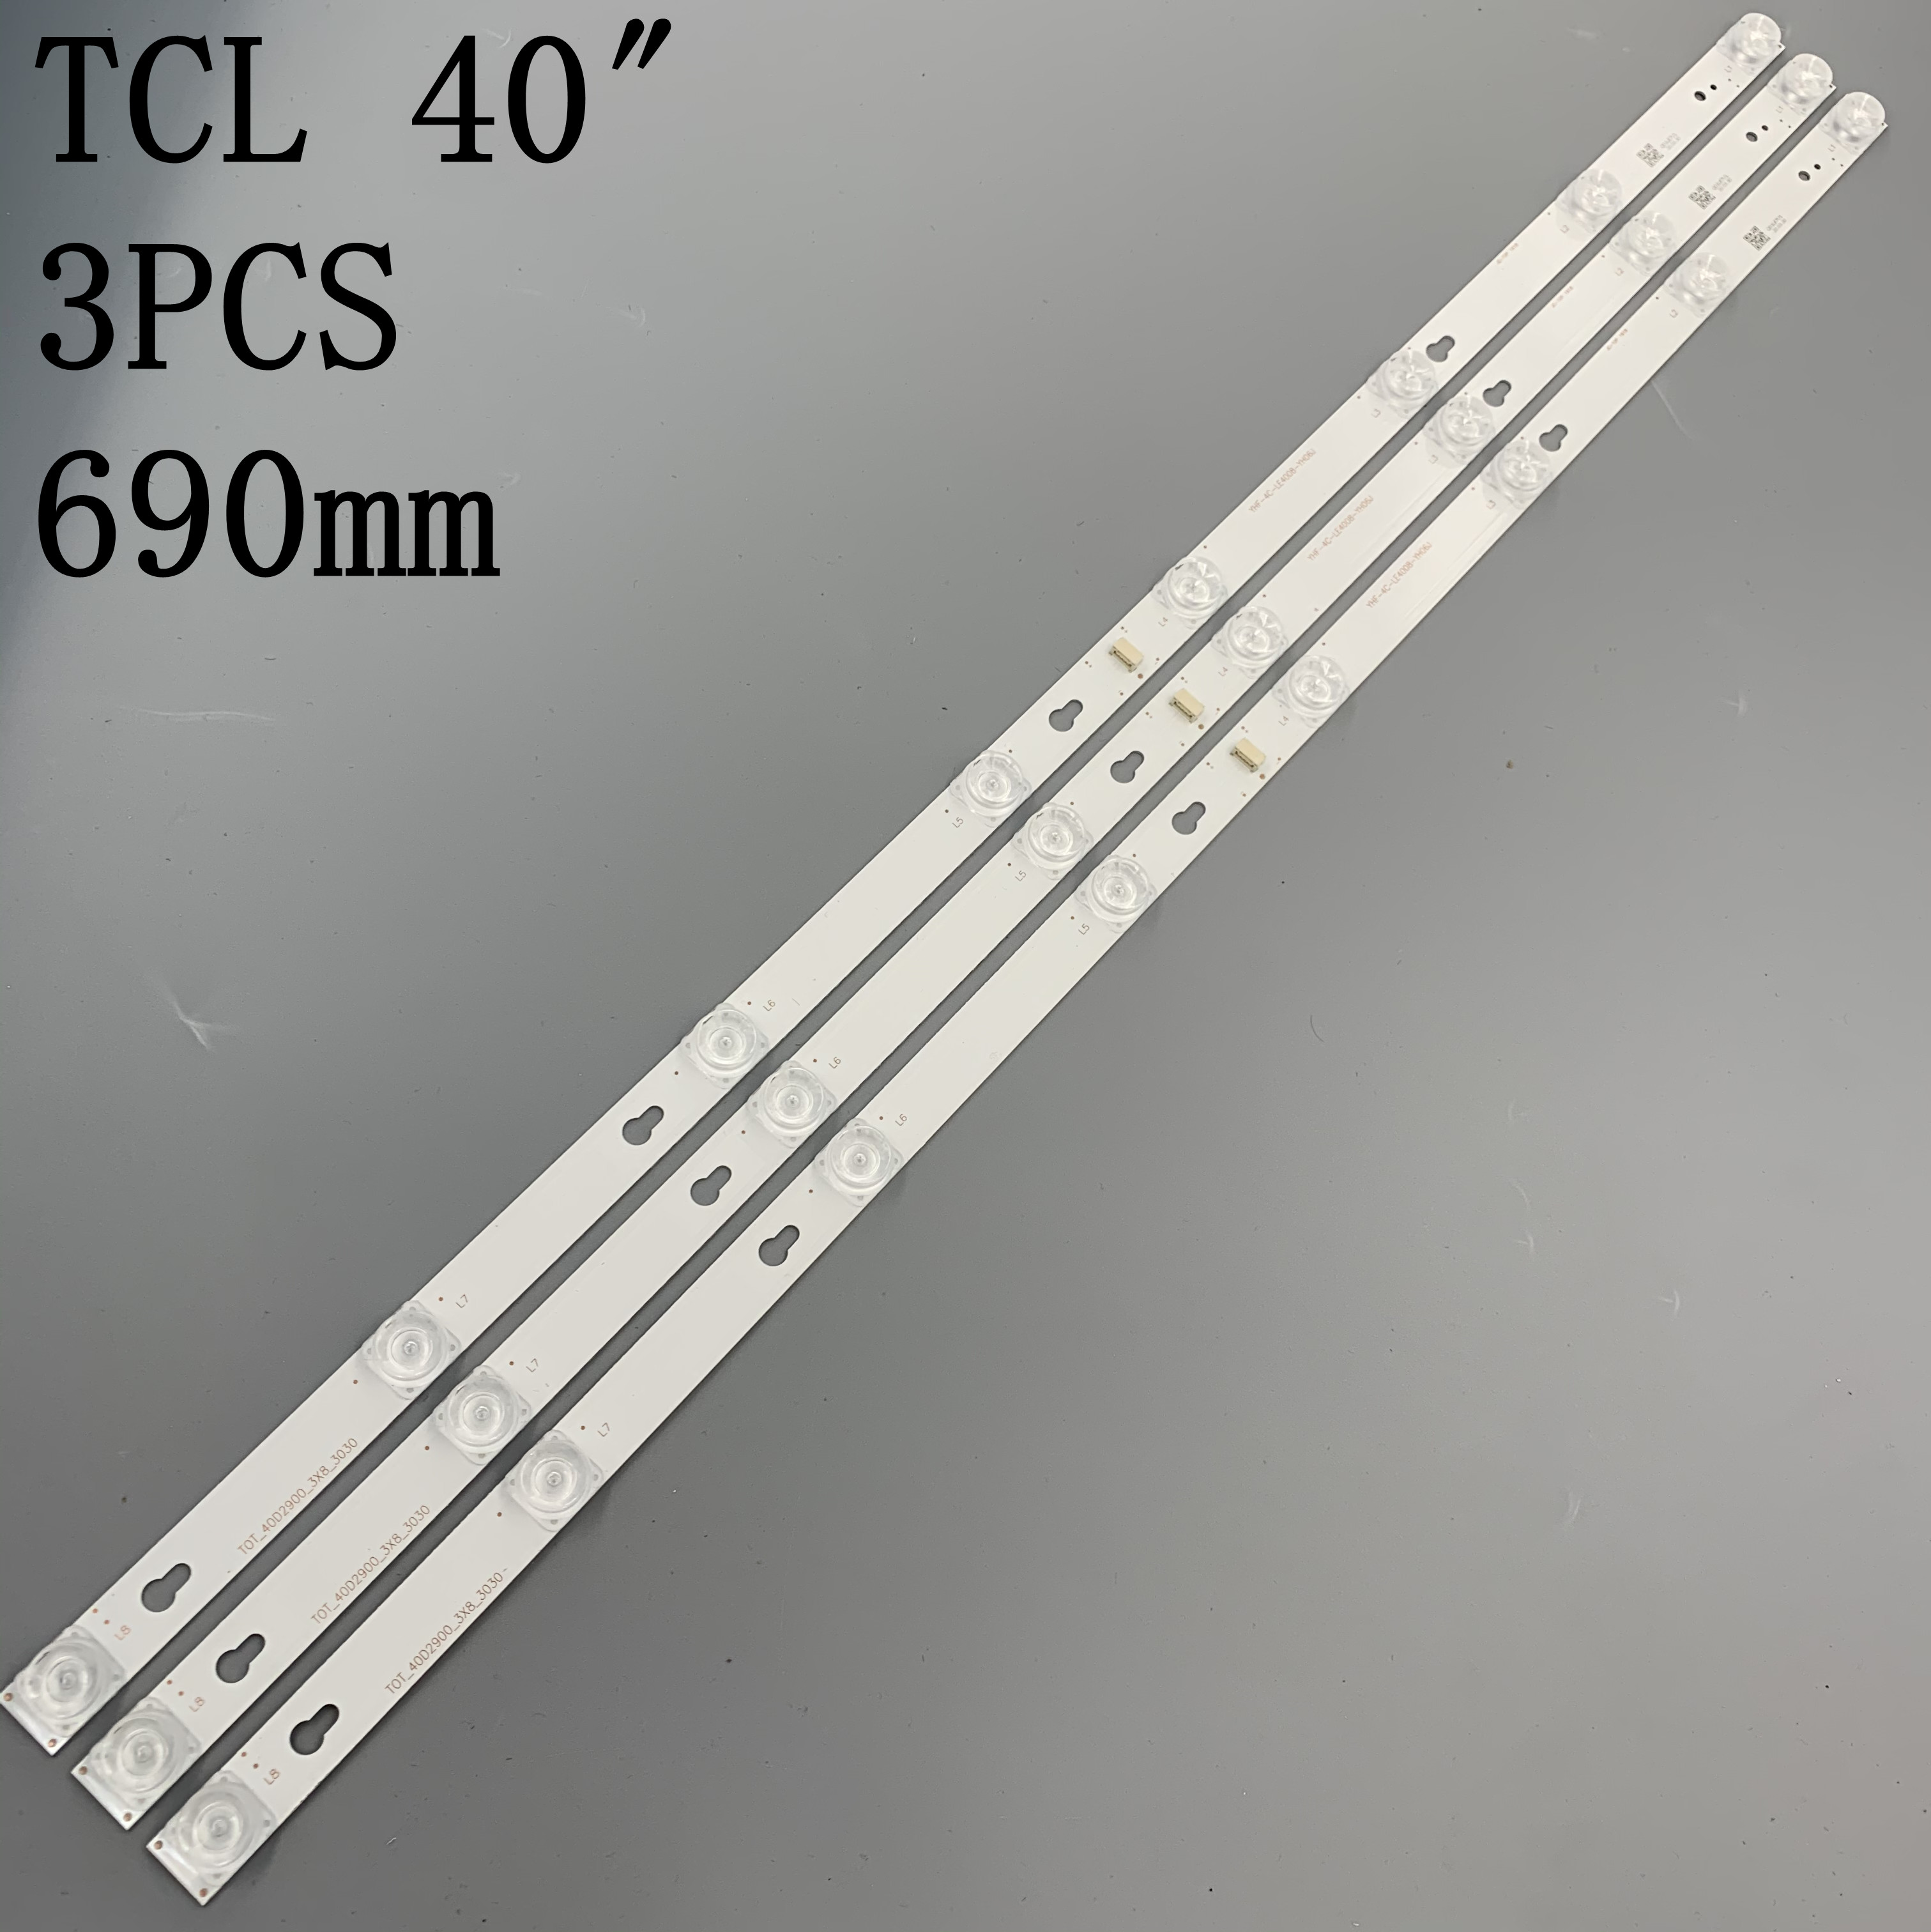 6 PCS LED backlight strip for Toshiba L40F3301B 40A730U 40l2600 L40D2900F TCL F40S5916 40S305 TOT_40D2900 40HR330M08A6 V8